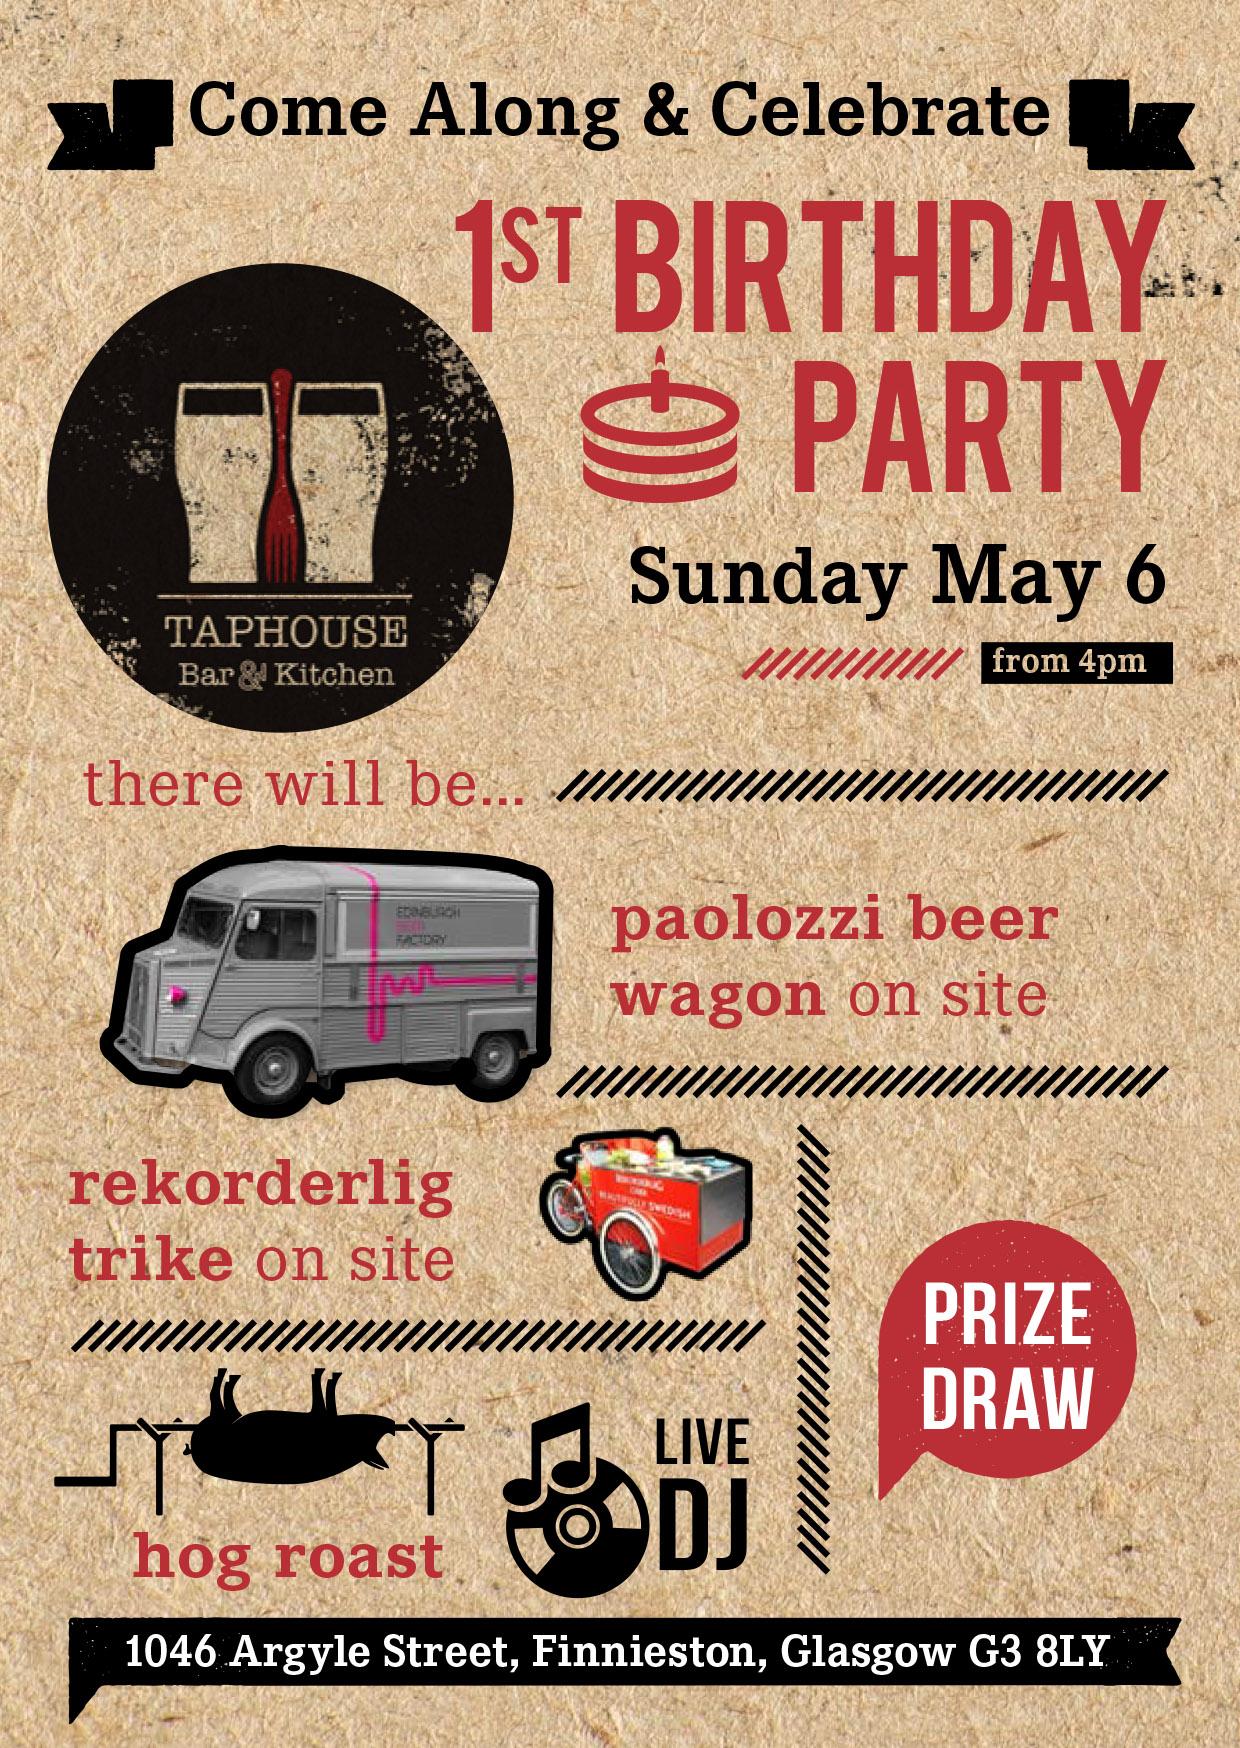 Taphouse A6 1st Birthday invite_25.04.jpg